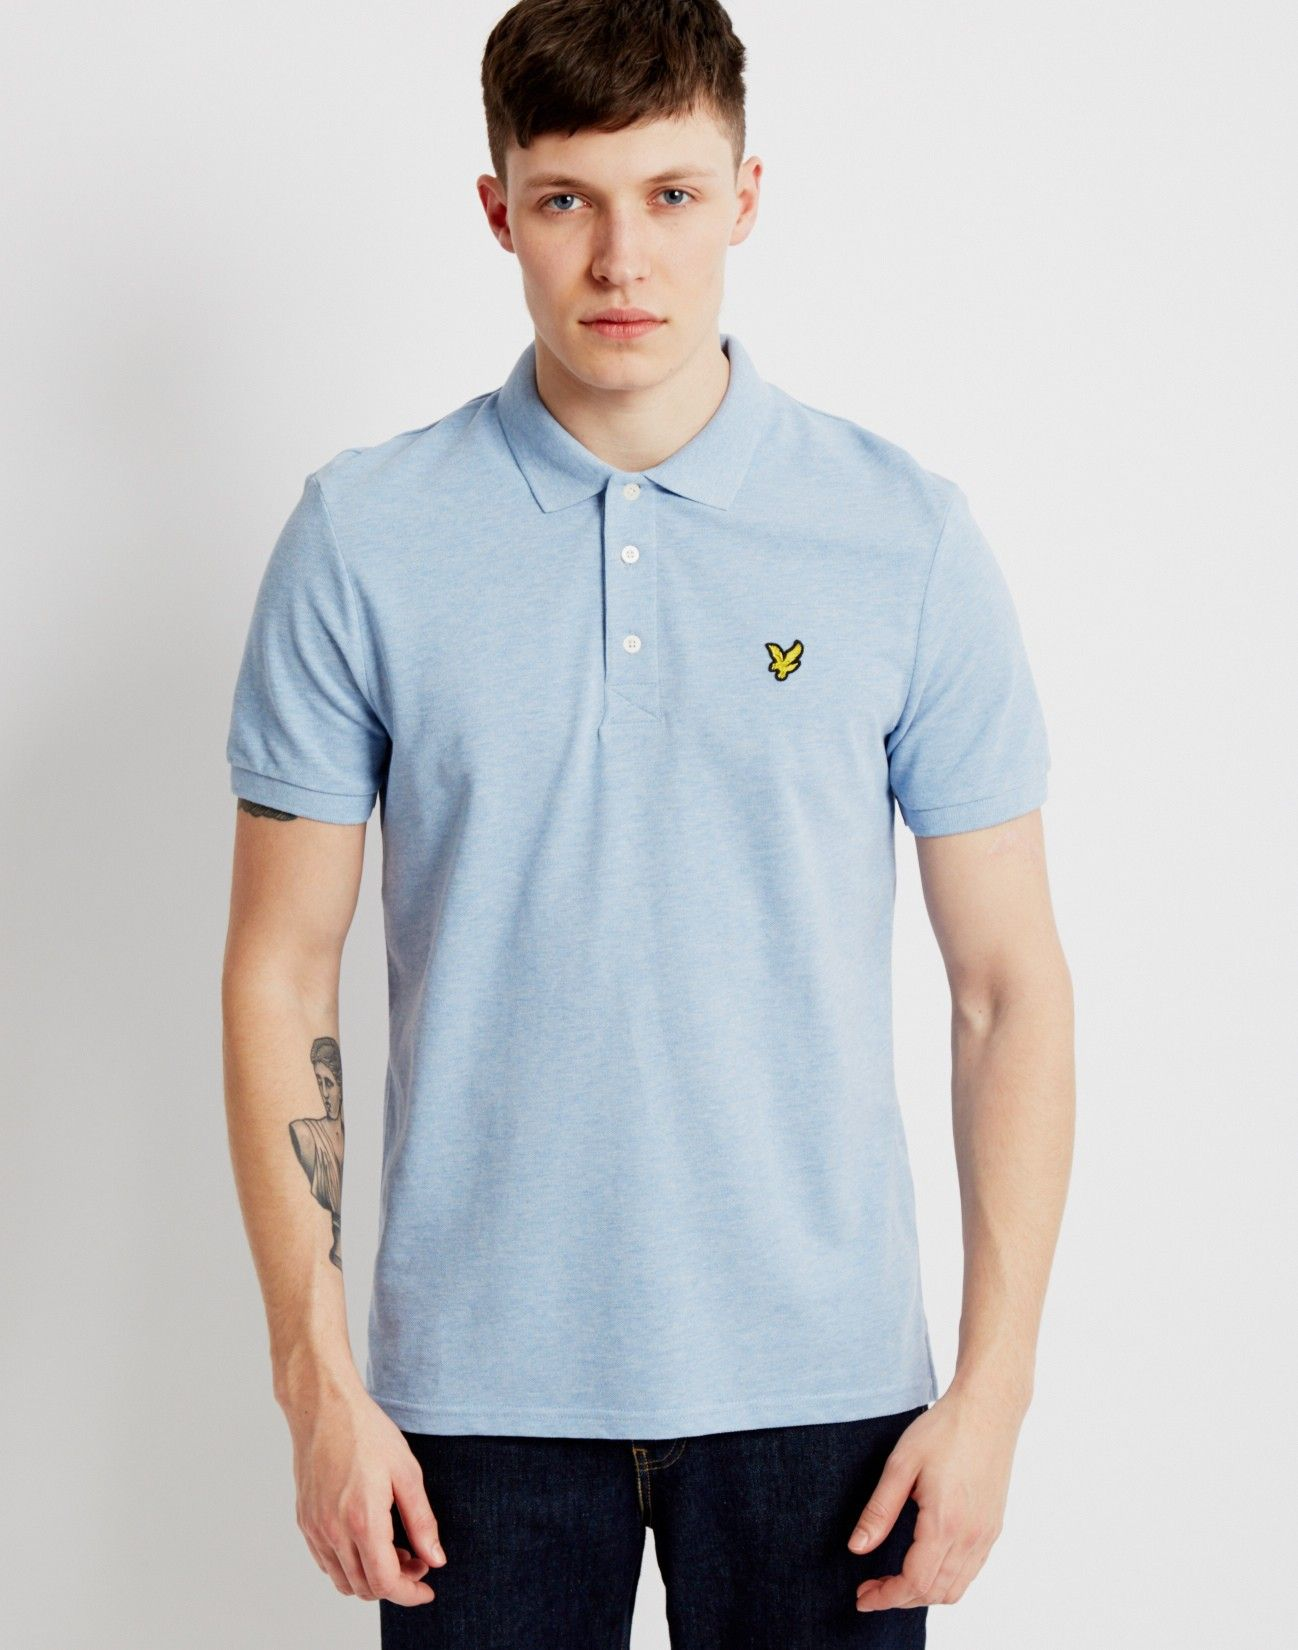 ab2925775 Lyle & Scott Polo Shirt Light Blue | Shop menswear at The Idle Man ...